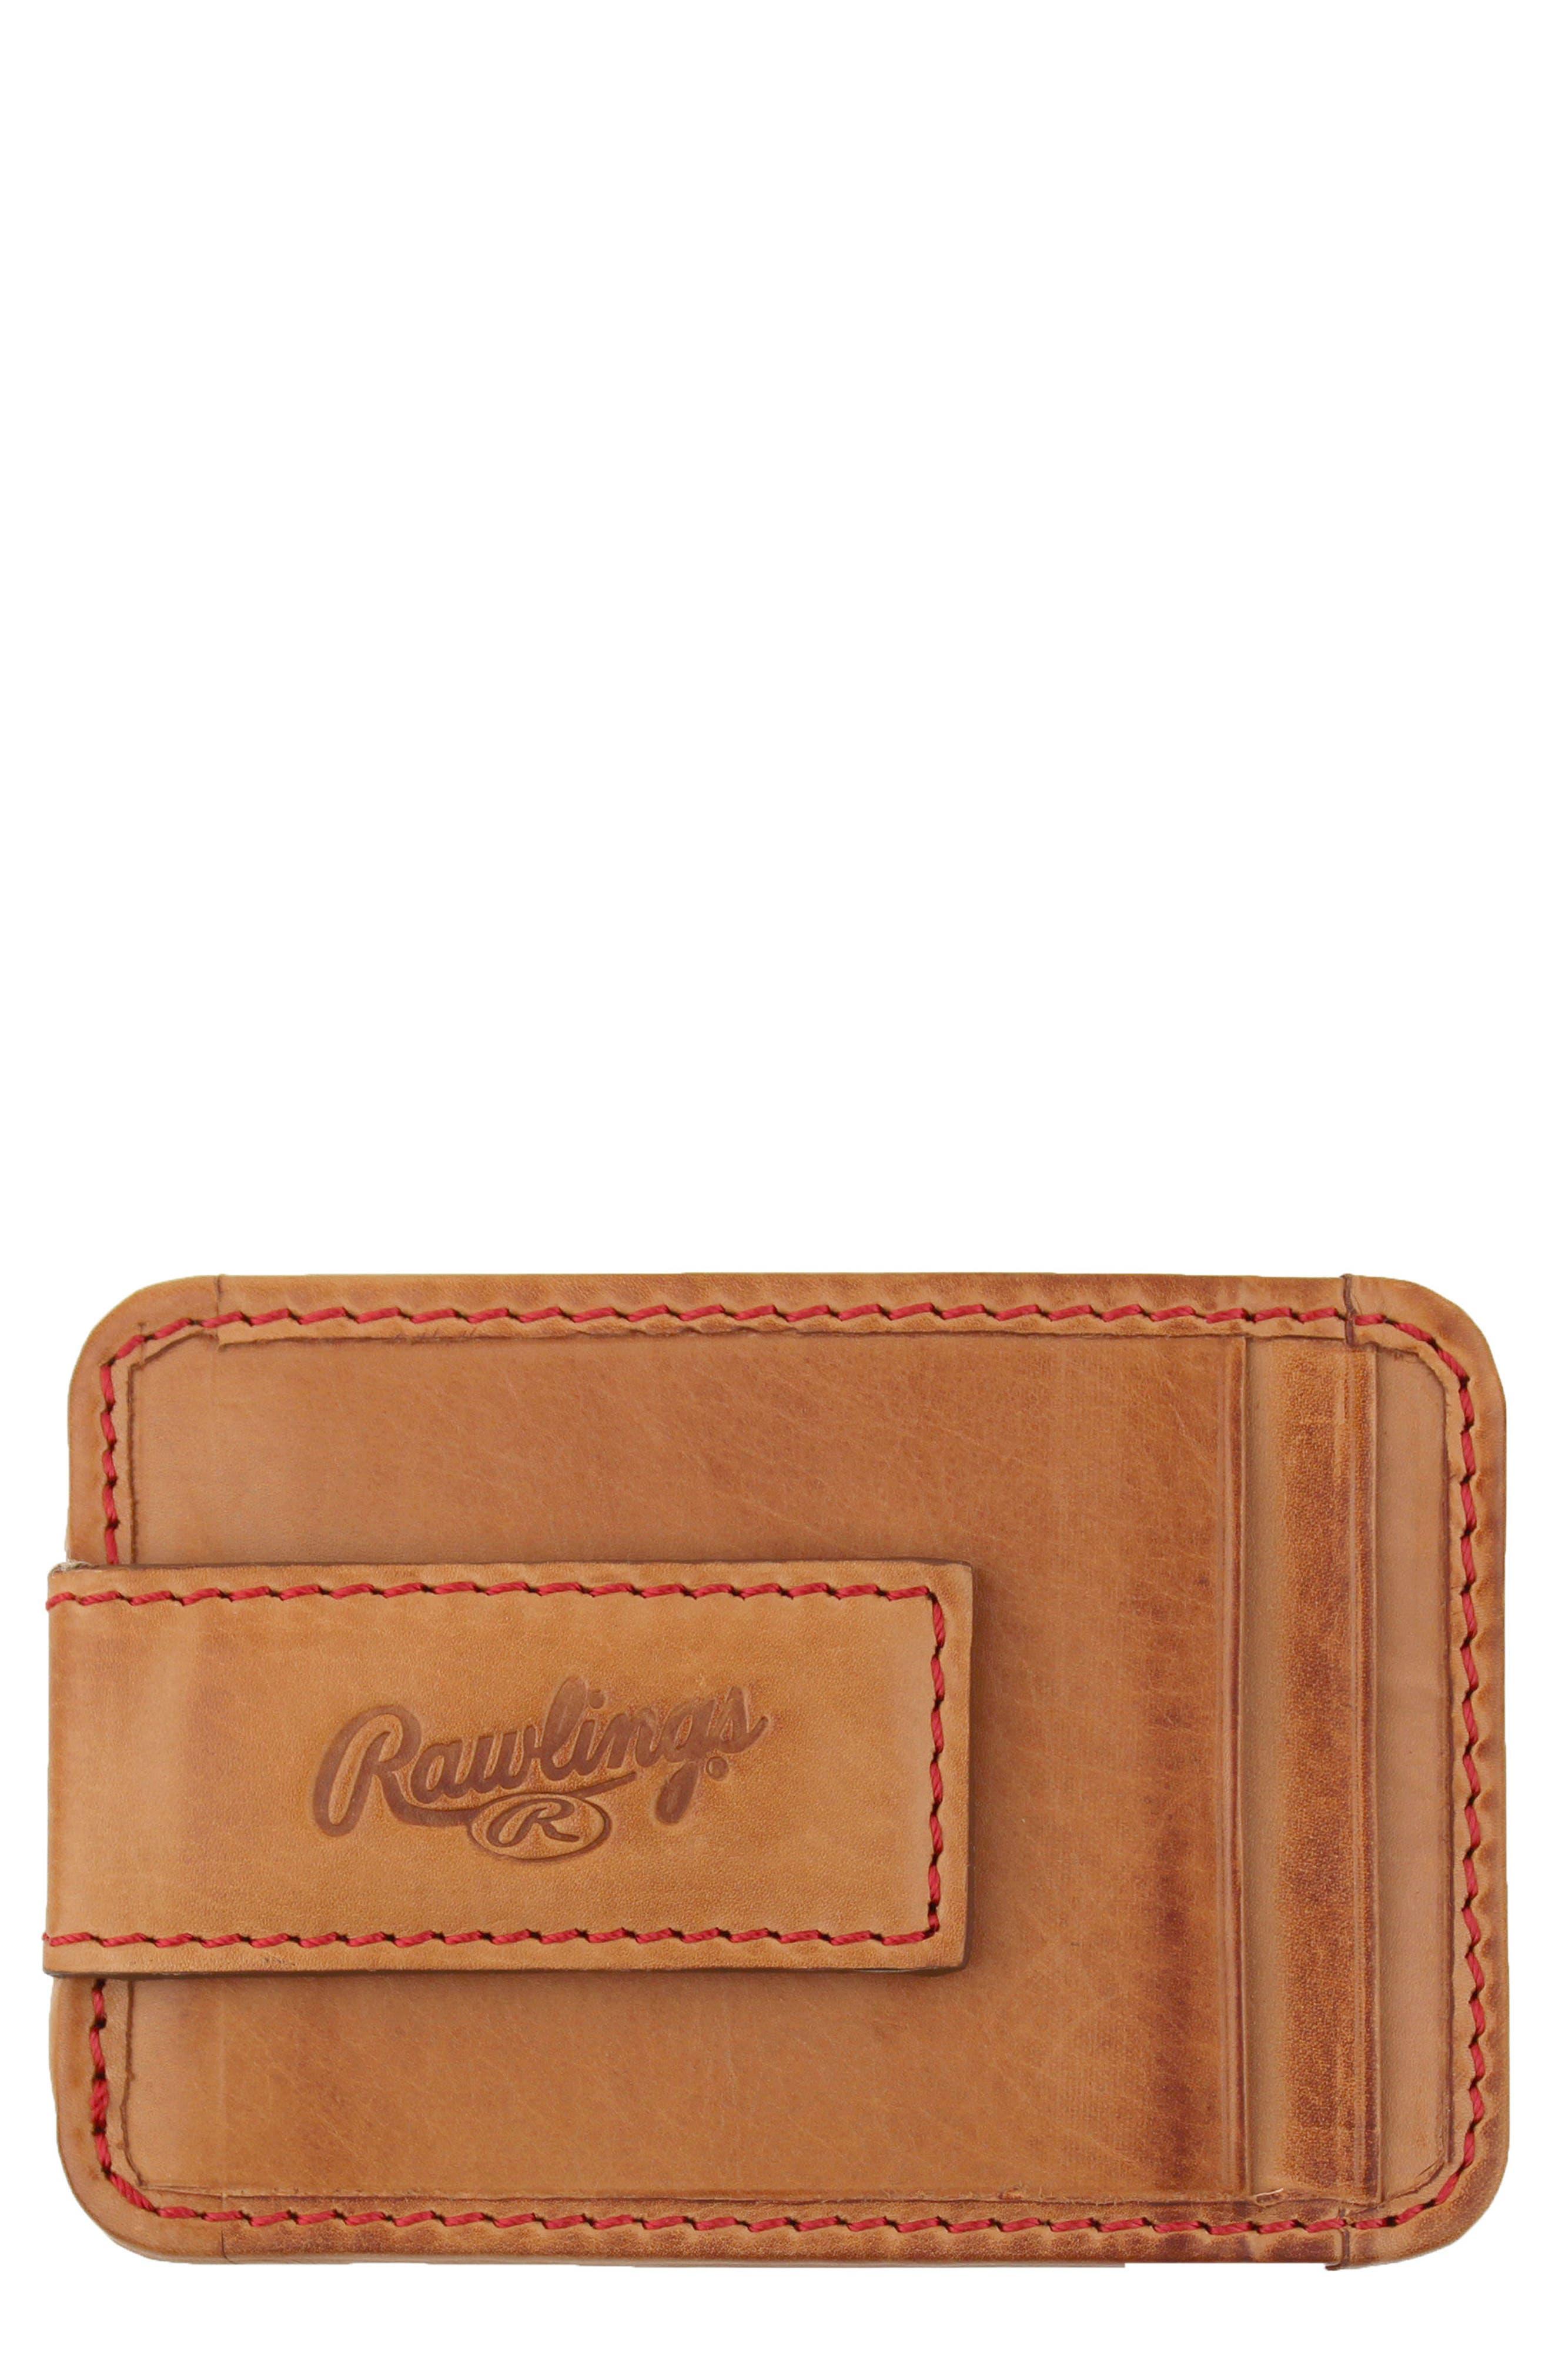 Baseball Stitch Money Clip Card Case,                             Main thumbnail 1, color,